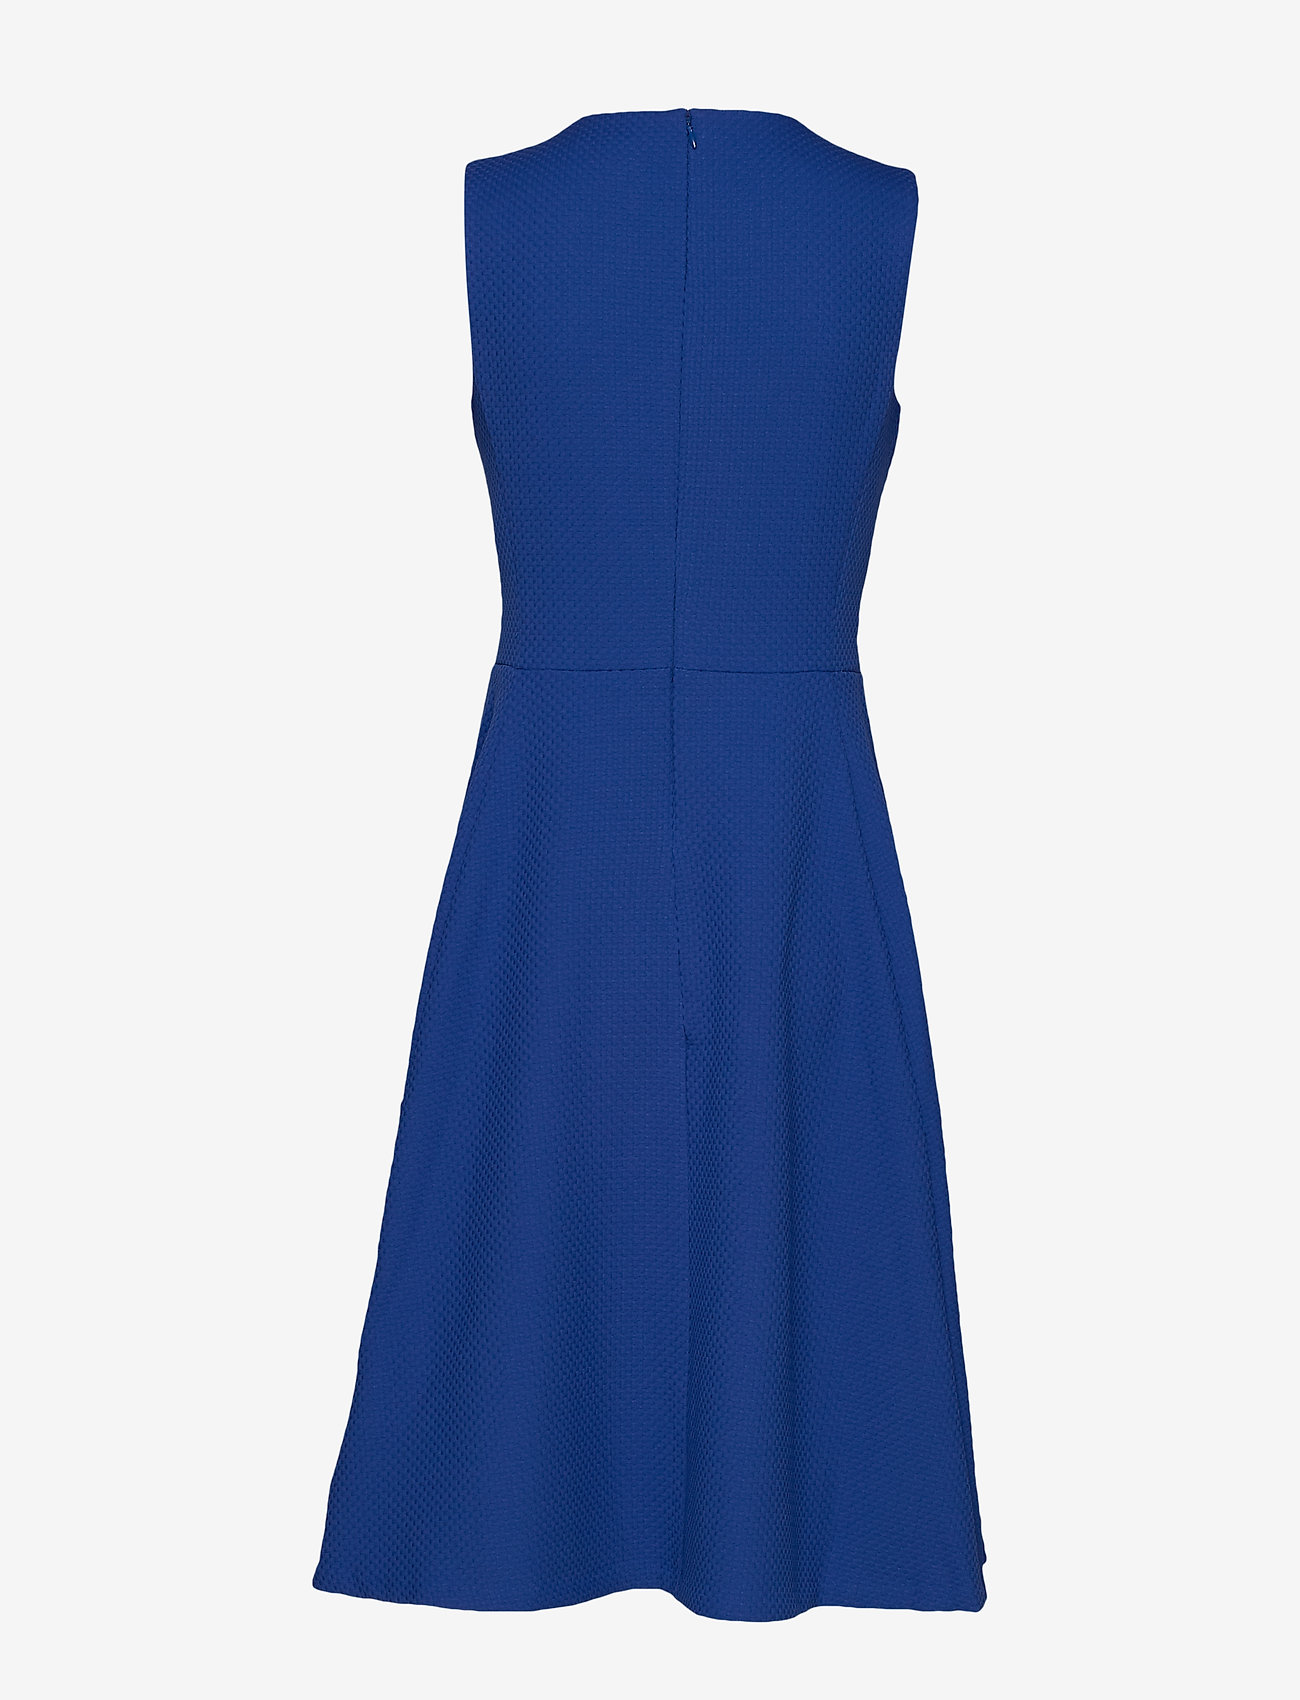 Lauren Ralph Lauren - BASKETWEAVE PONTE-DRESS - juhlamekot - french blue